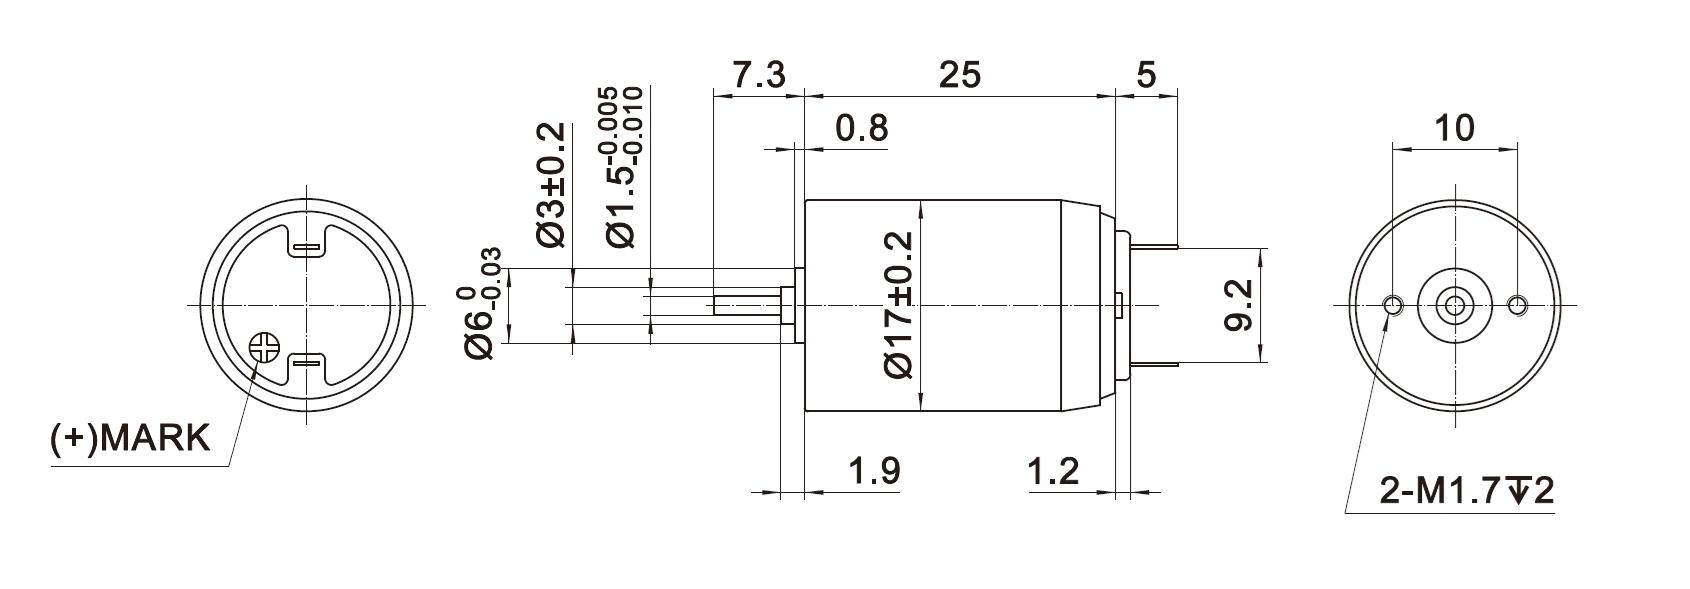 Dimension of DCU17025 Coreless Brushed DC Motors